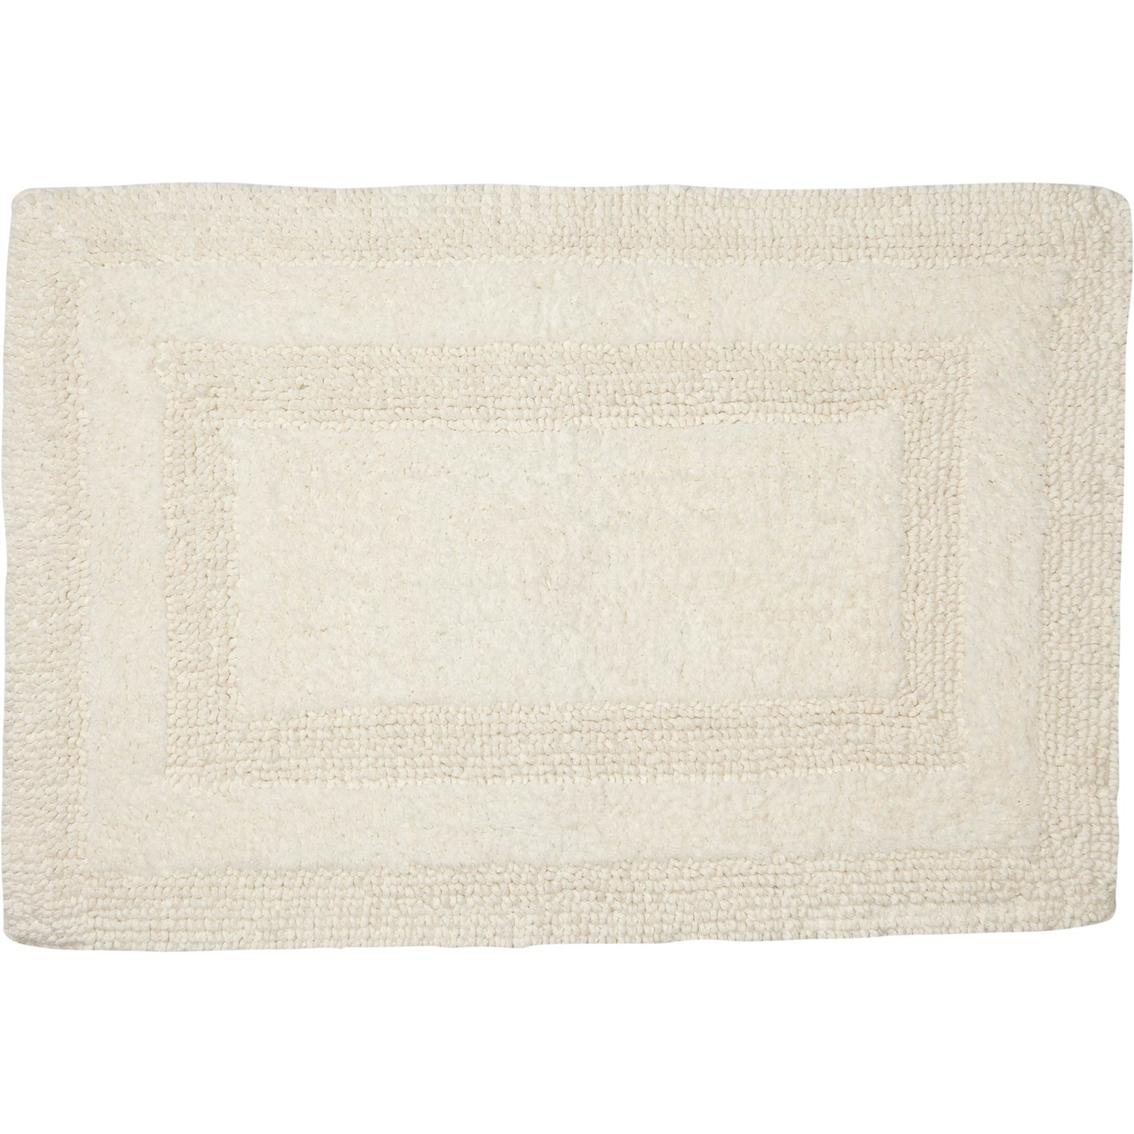 Reversible Bathroom Mats: Savannah Reversible Cotton Bath Rug